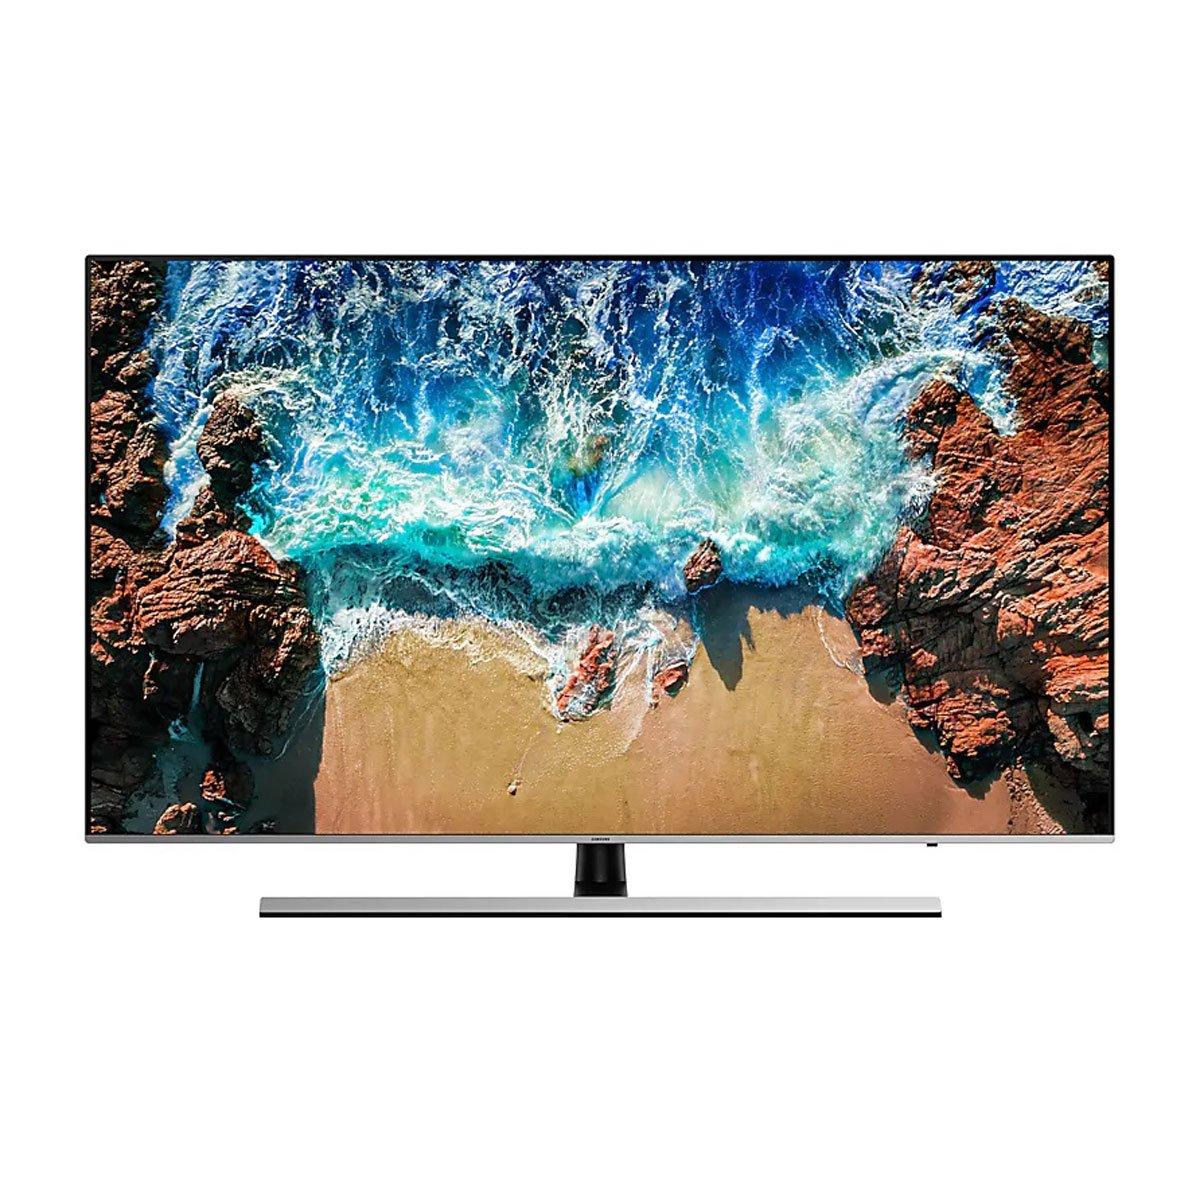 "Sears: Pantalla Samsung 55"" Serie 8 120Hz 4K UHD Smart TV NU8000"